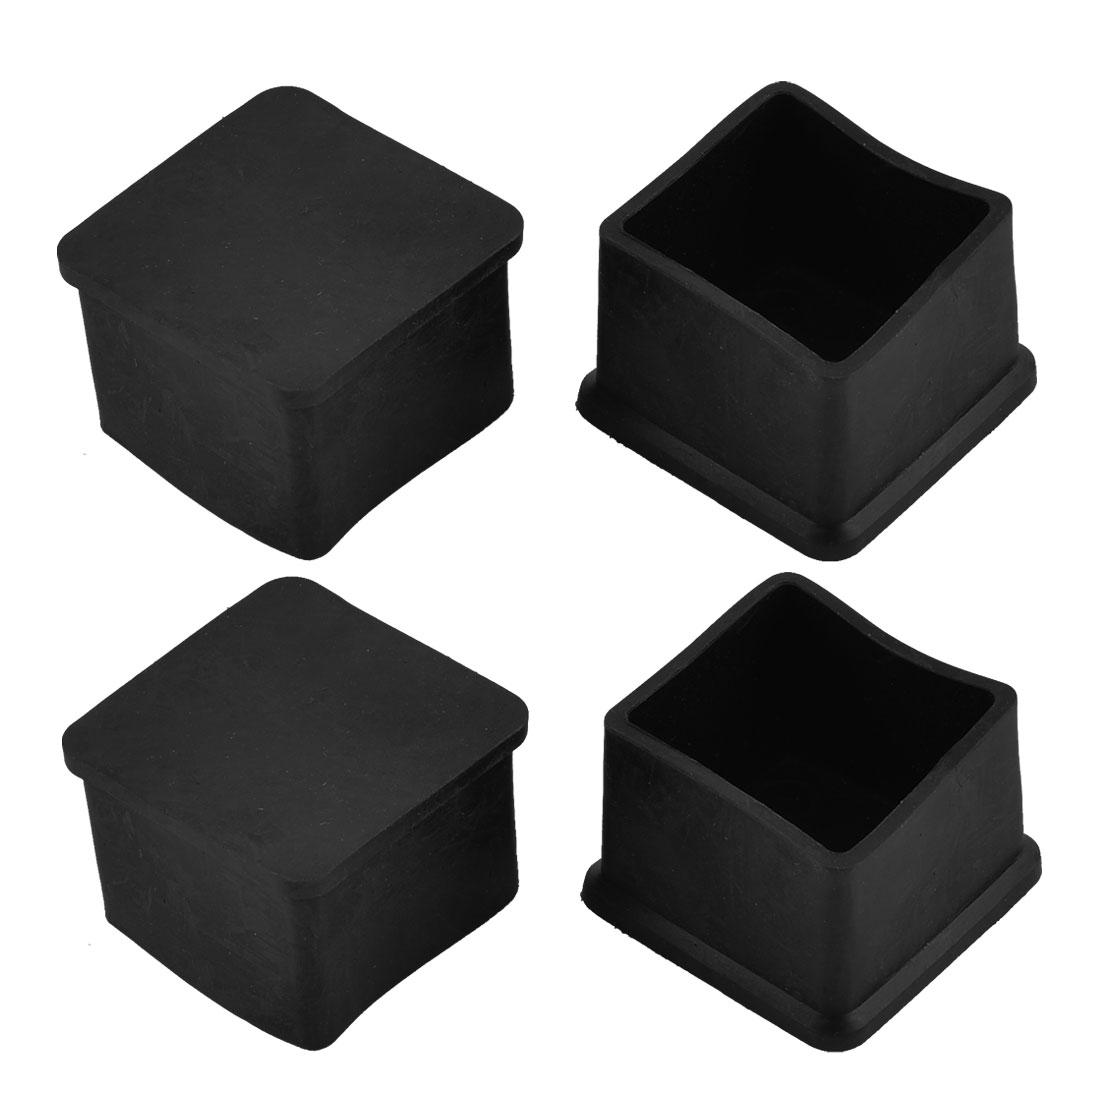 35mm x 35mm Square Shaped Furniture Table Leg Foot Rubber Cover Caps Black 4pcs